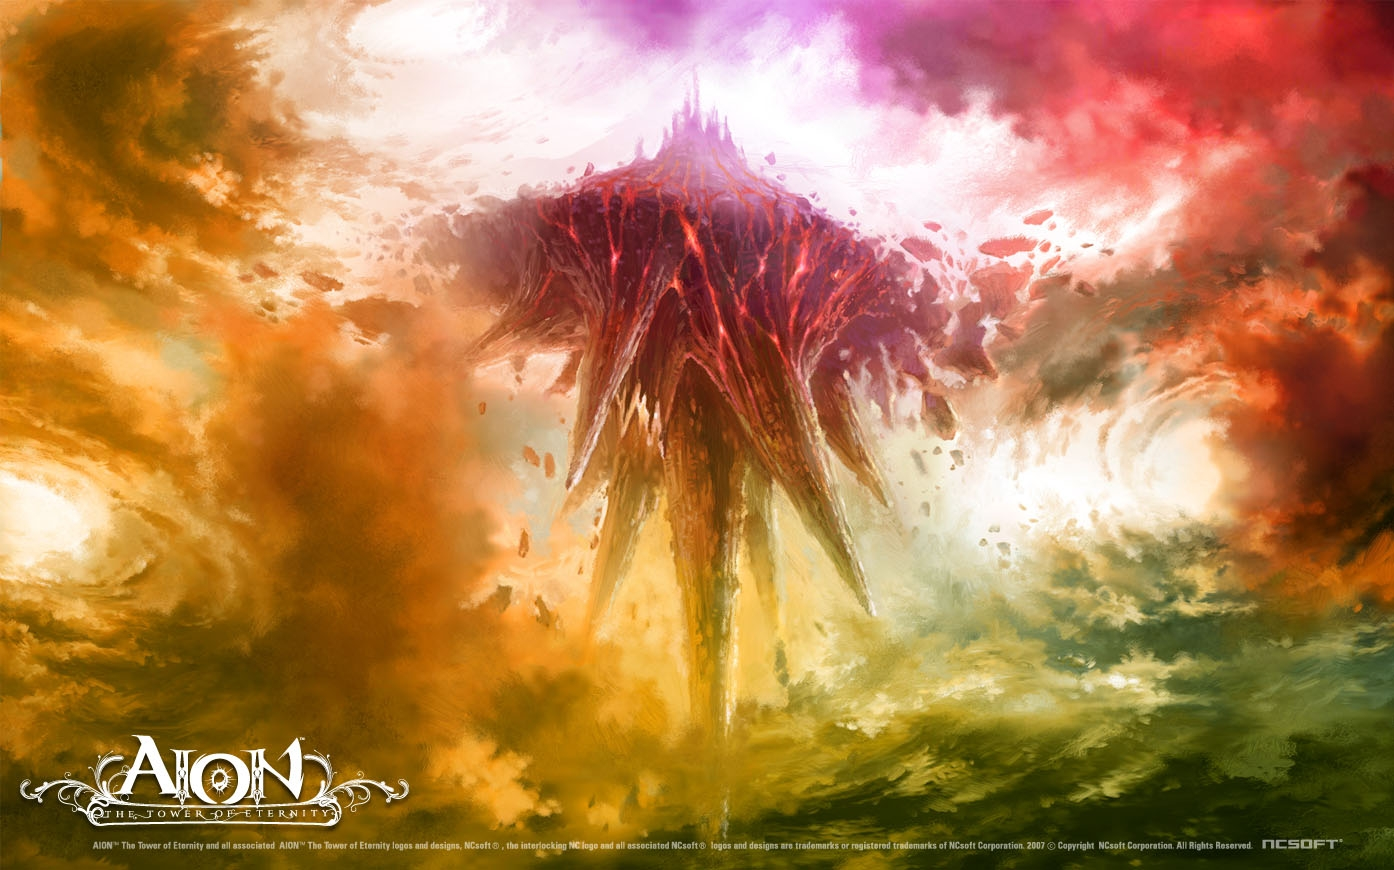 http://2.bp.blogspot.com/-xlNeJvQ6-QI/TaJX-QB86qI/AAAAAAAABRc/pjoUE-EN2Ao/s1600/AION-Wallpaper-Screenshot-PC-Game-Online-18.jpg